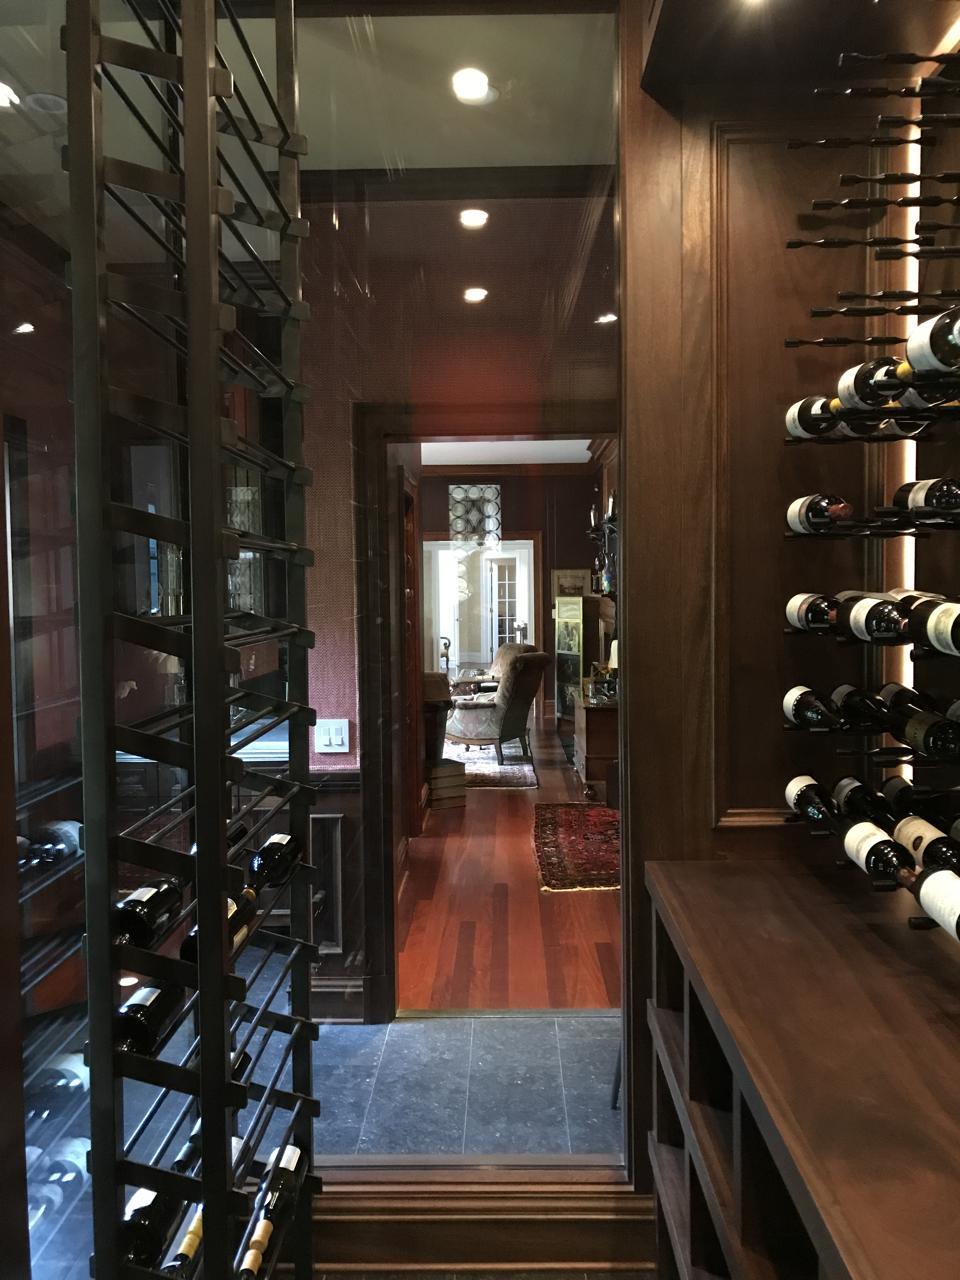 Wine cellars are no longer underground